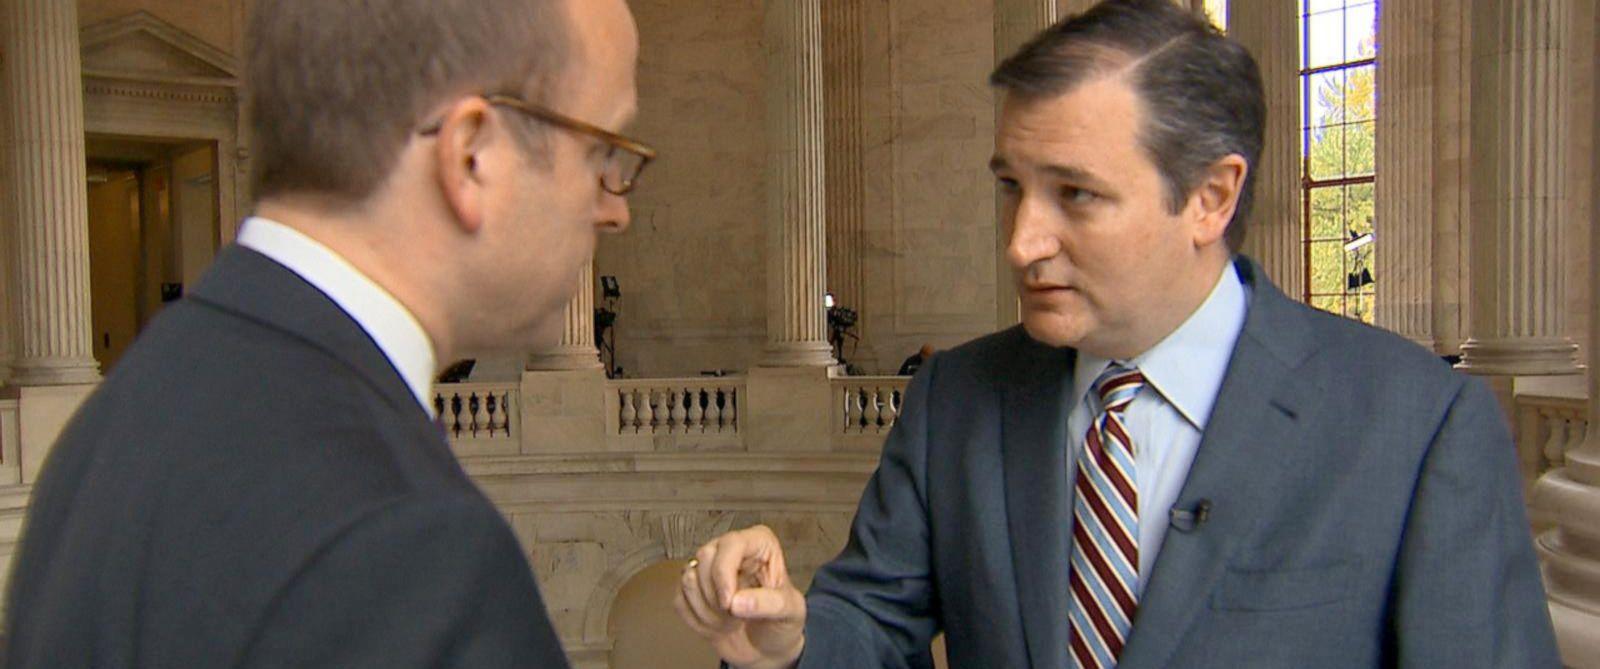 PHOTO: Sen. Ted Cruz discusses Syrian refugees with ABC Chief White House Correspondent Jon Karl.